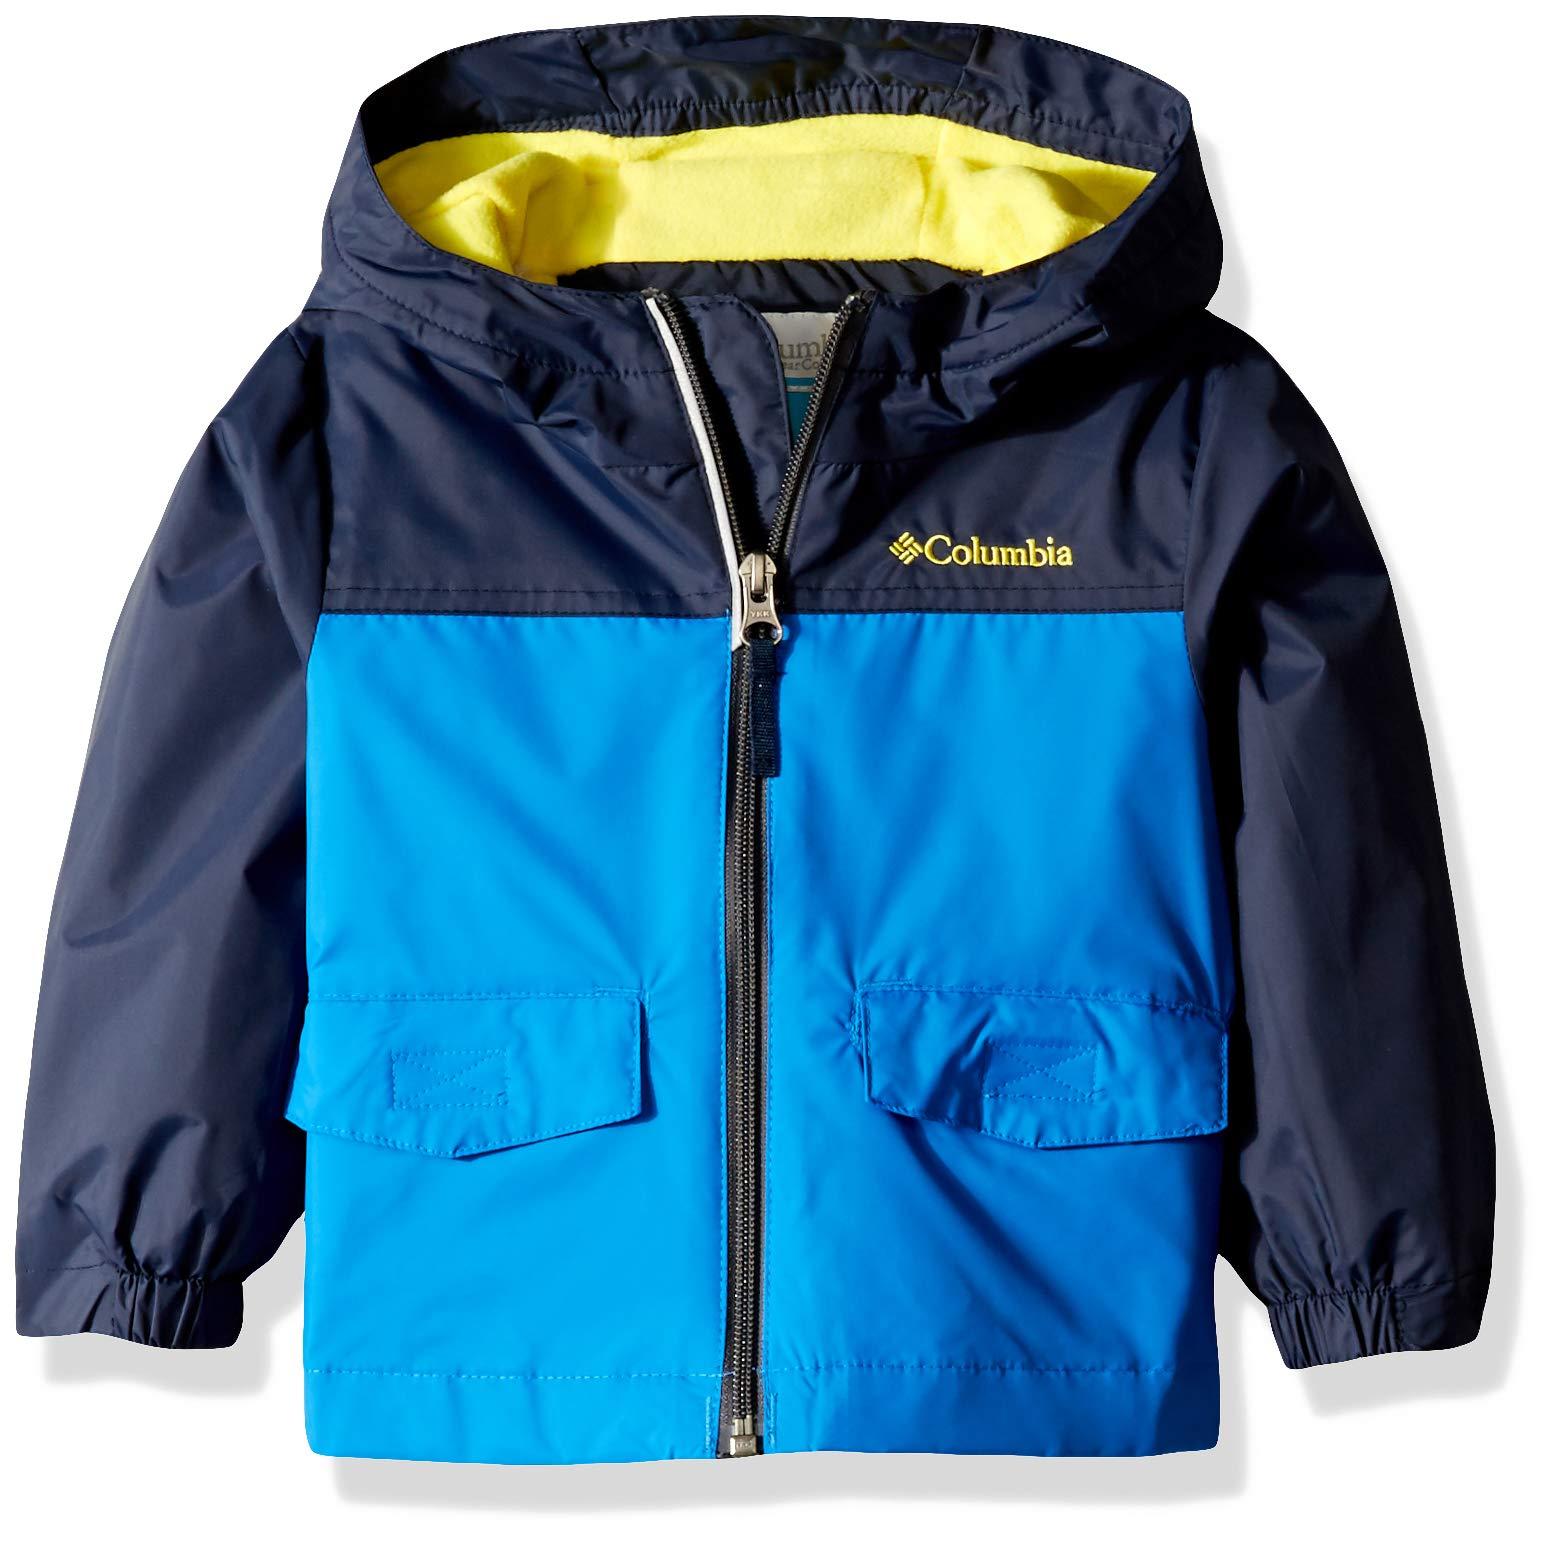 Columbia Boys' Toddler Rain-Zilla Jacket, Super Blue/Collegiate Navy, 2T